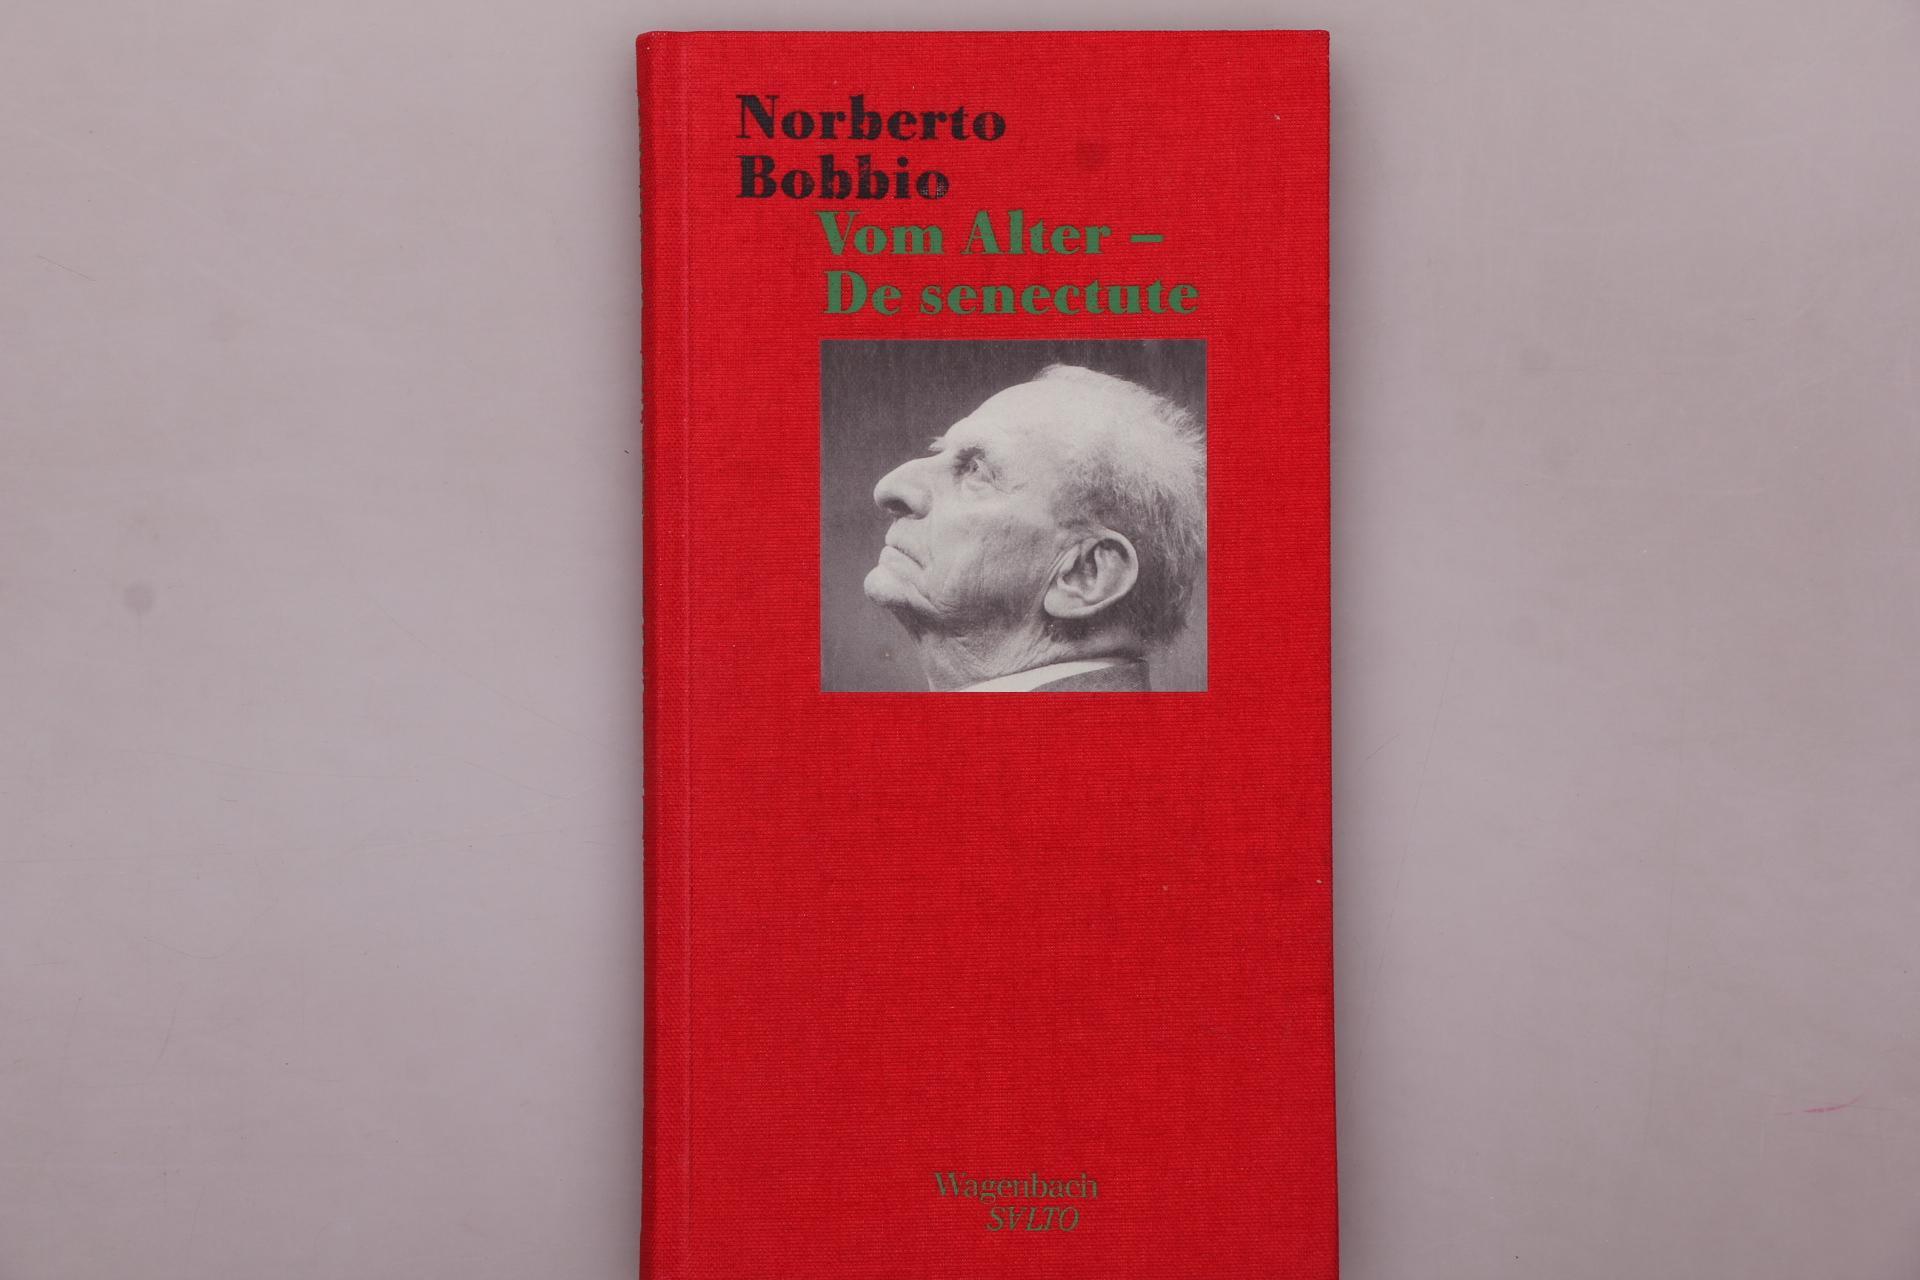 VOM ALTER - DE SENECTUTE. - Bobbio, Norberto